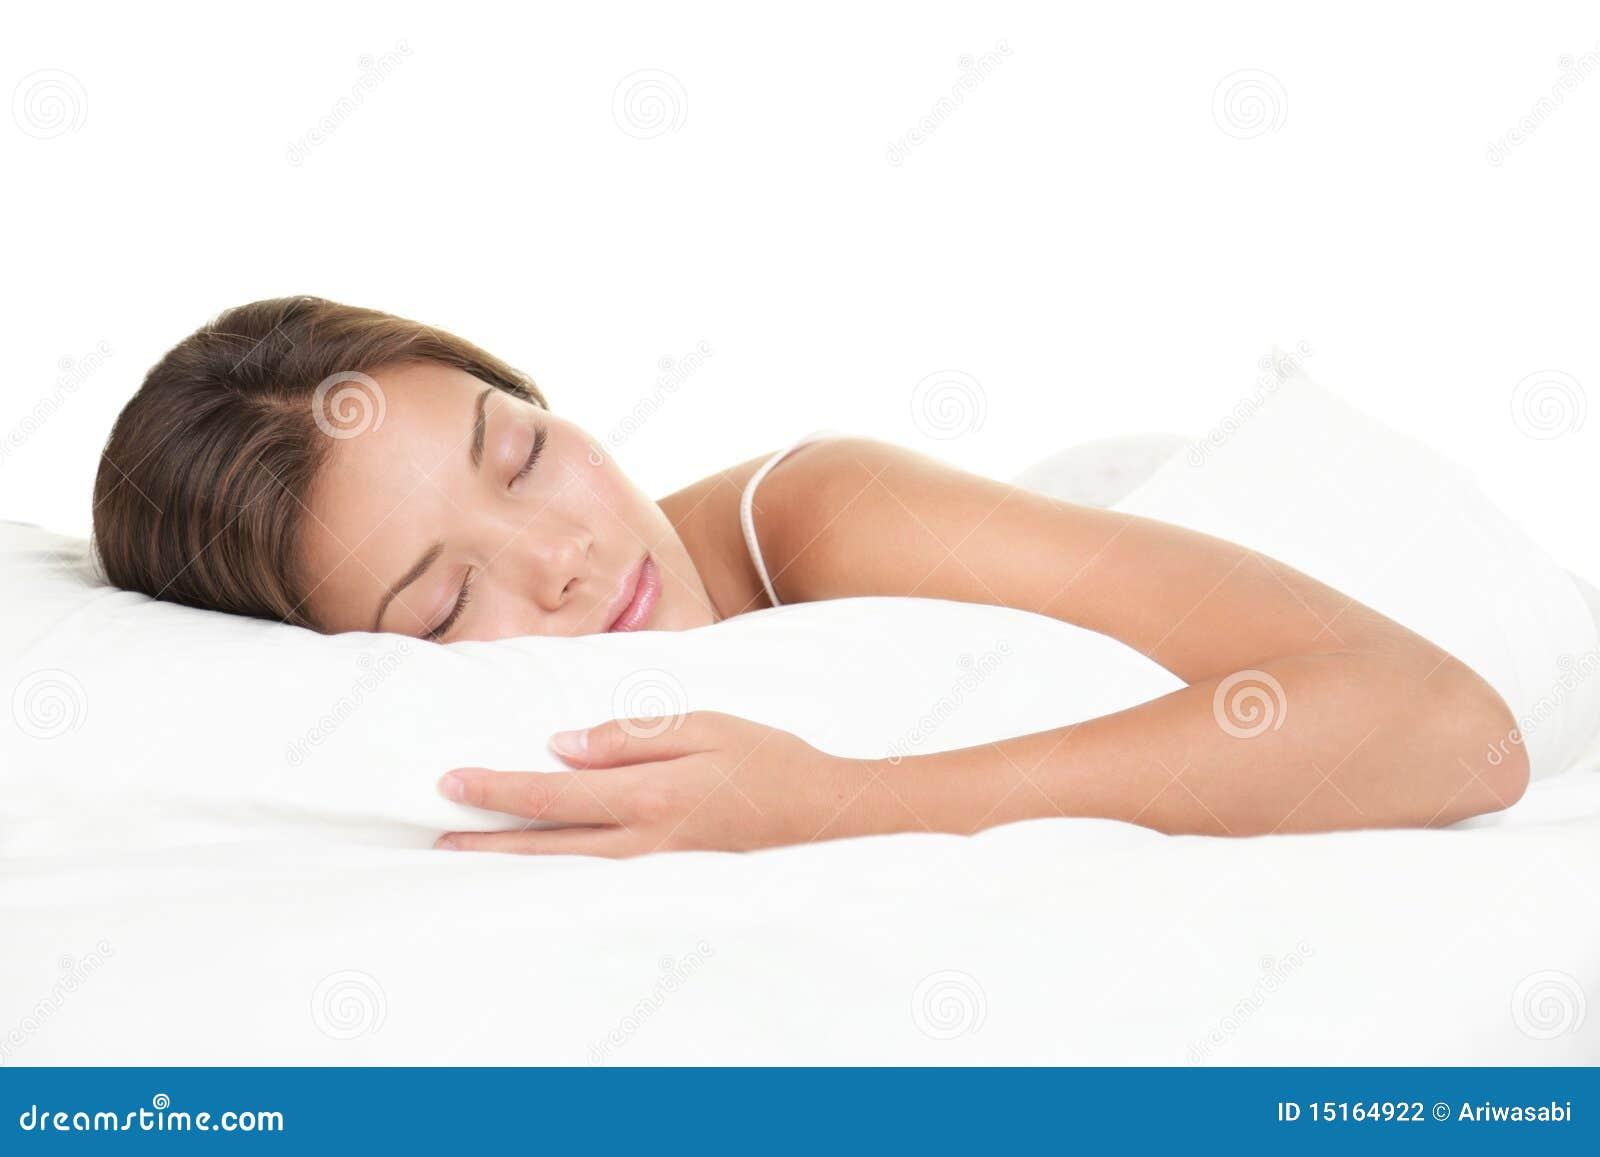 Woman Sleeping On White Background Stock Photography